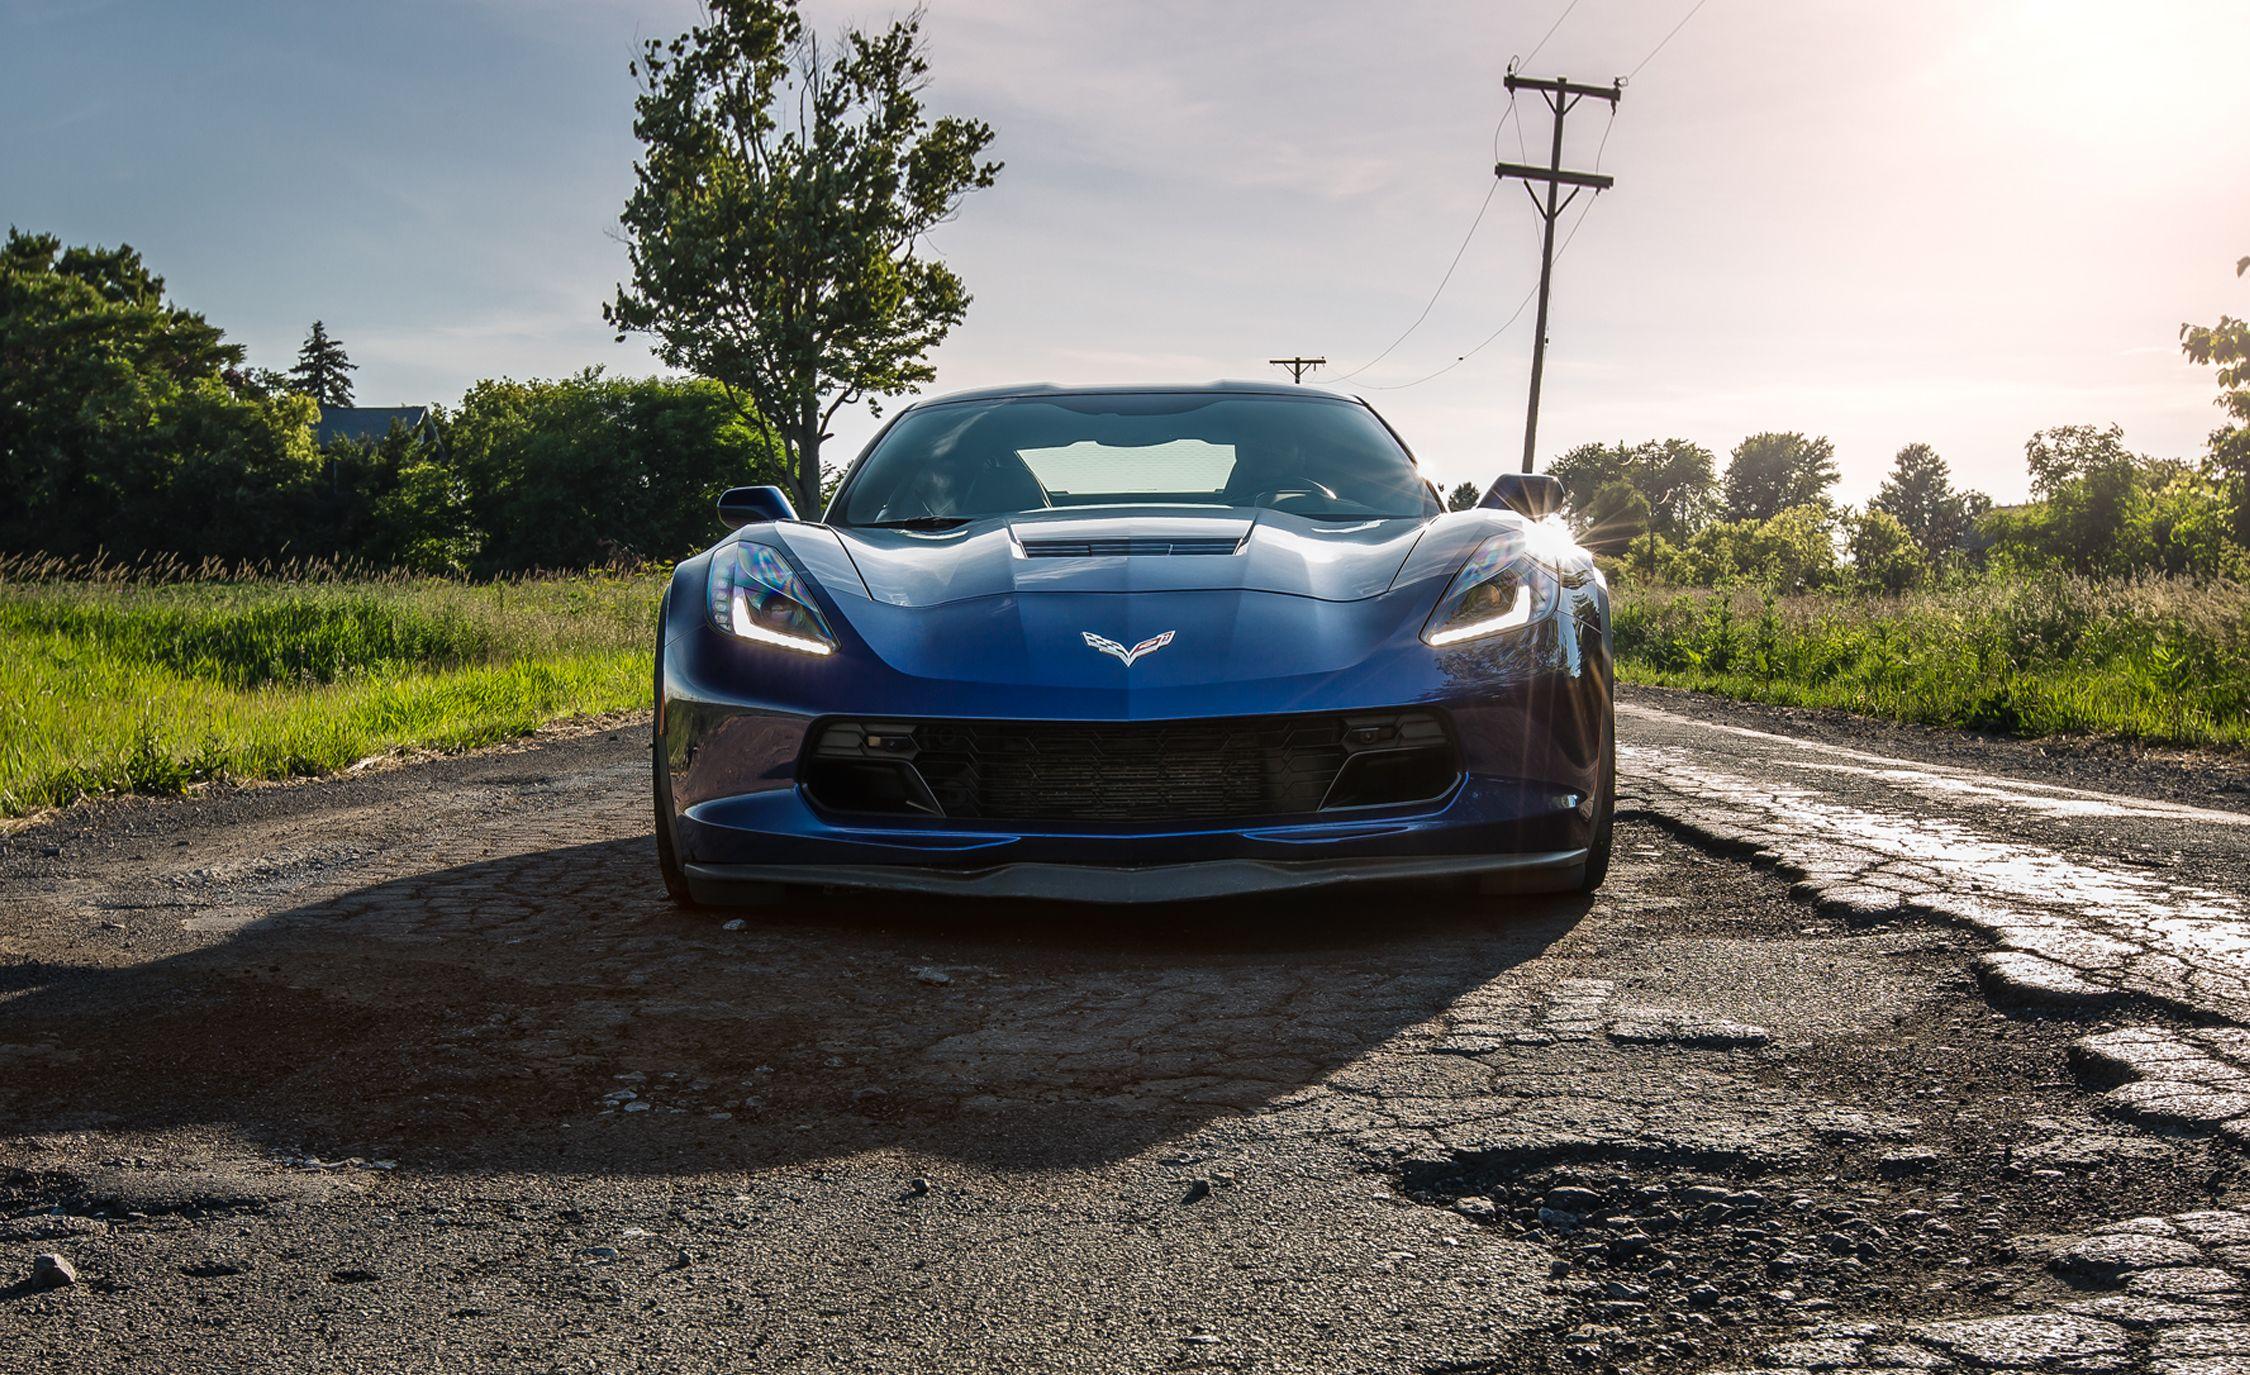 Kelebihan Kekurangan Chevrolet Corvette C7 Tangguh